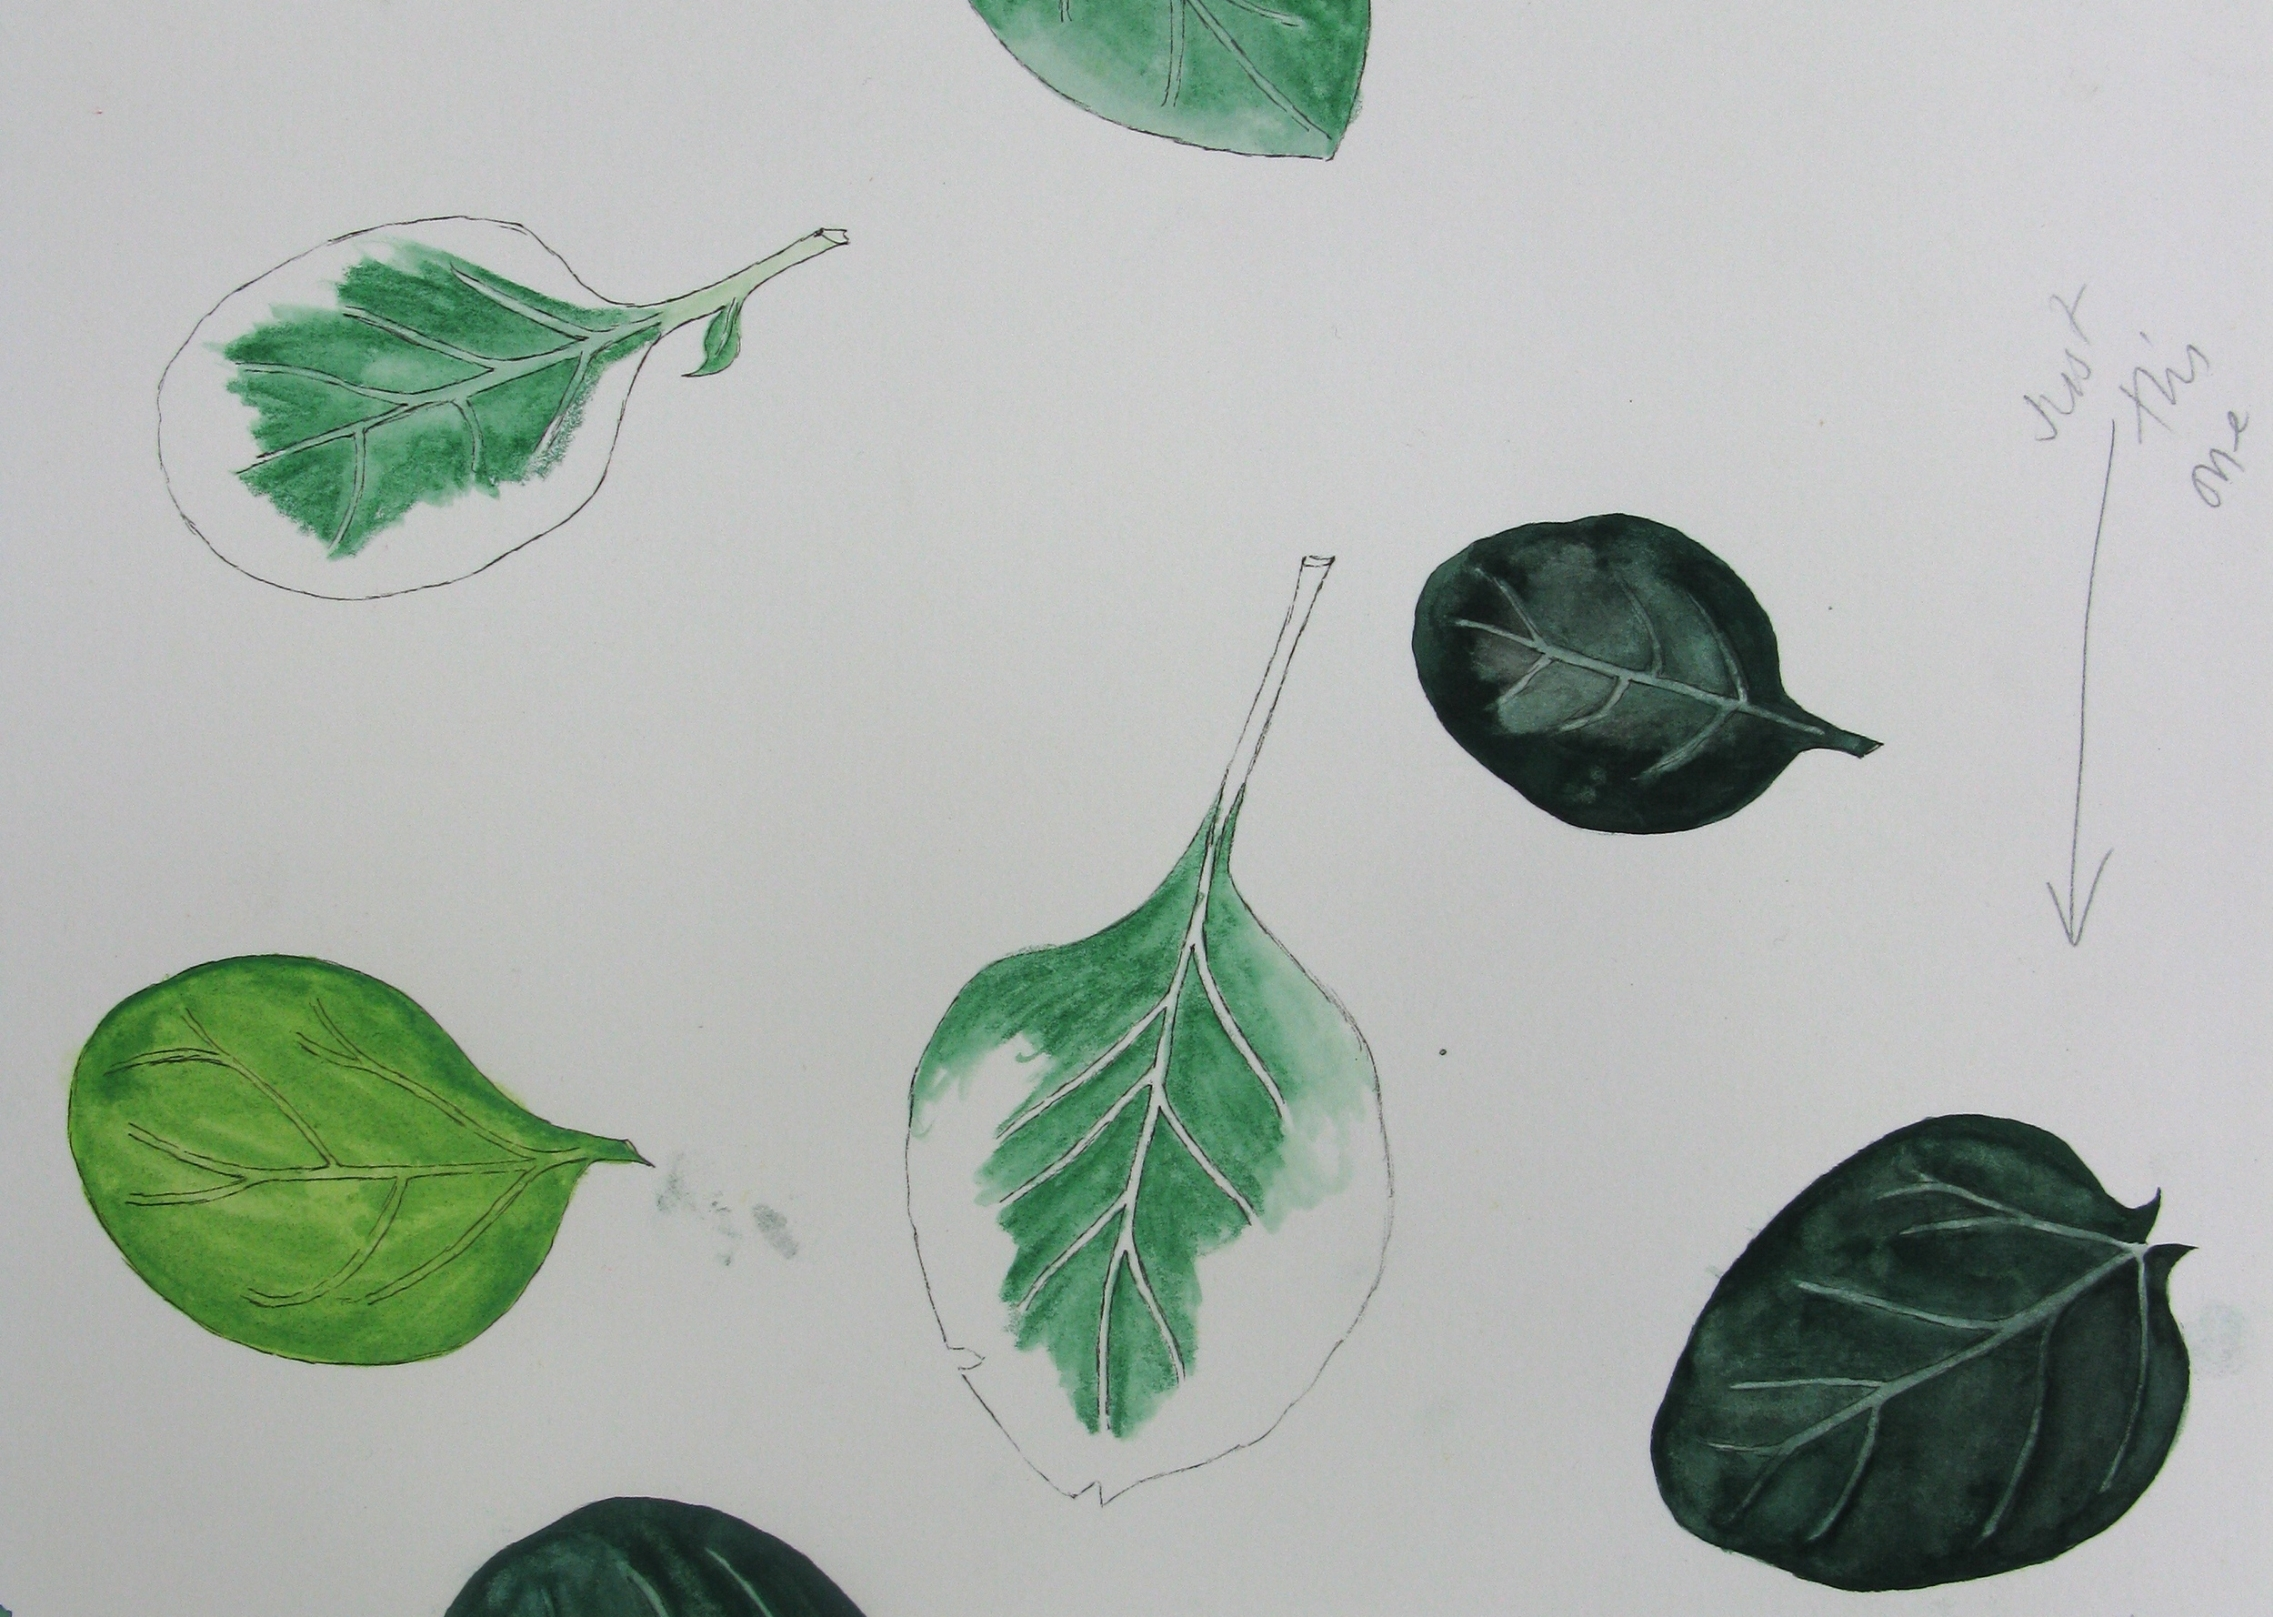 Mollie Katzen's Spinach-Basmati Soup with Yogurt